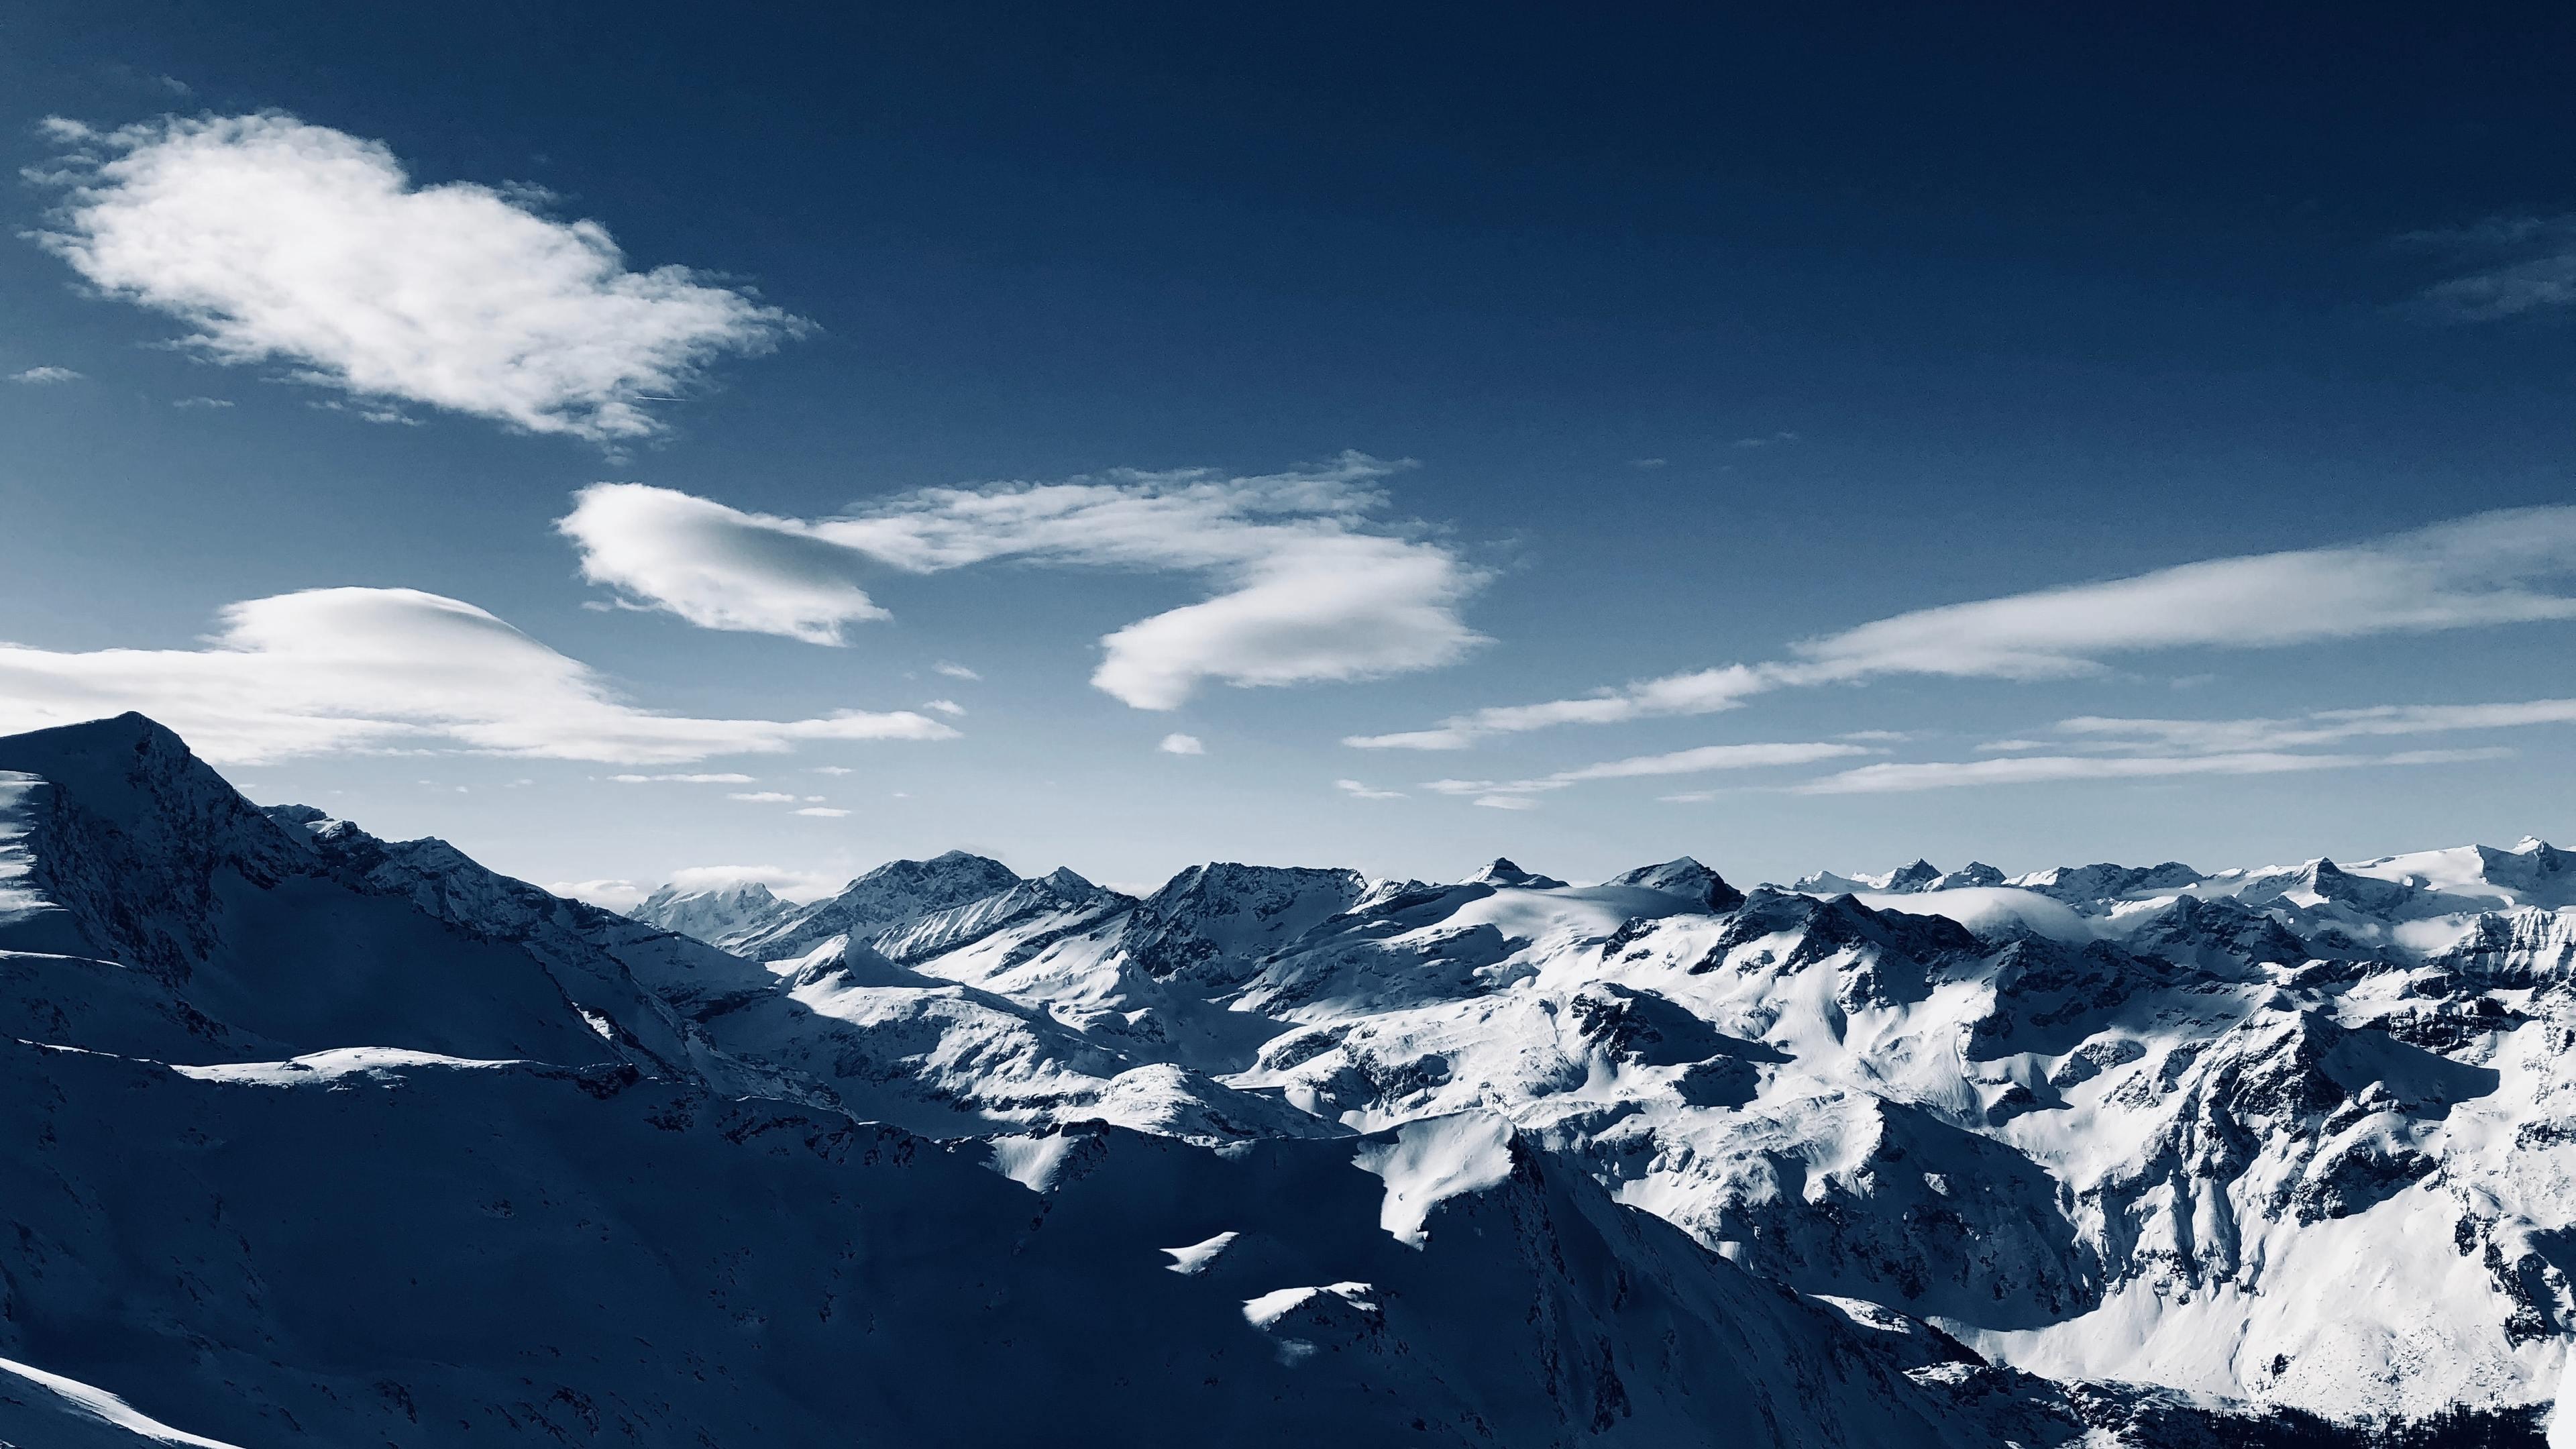 blue sky high angle mountains clear sky 4k 1540141105 - Blue Sky High Angle Mountains Clear Sky 4k - sky wallpapers, nature wallpapers, mountains wallpapers, hd-wallpapers, 4k-wallpapers